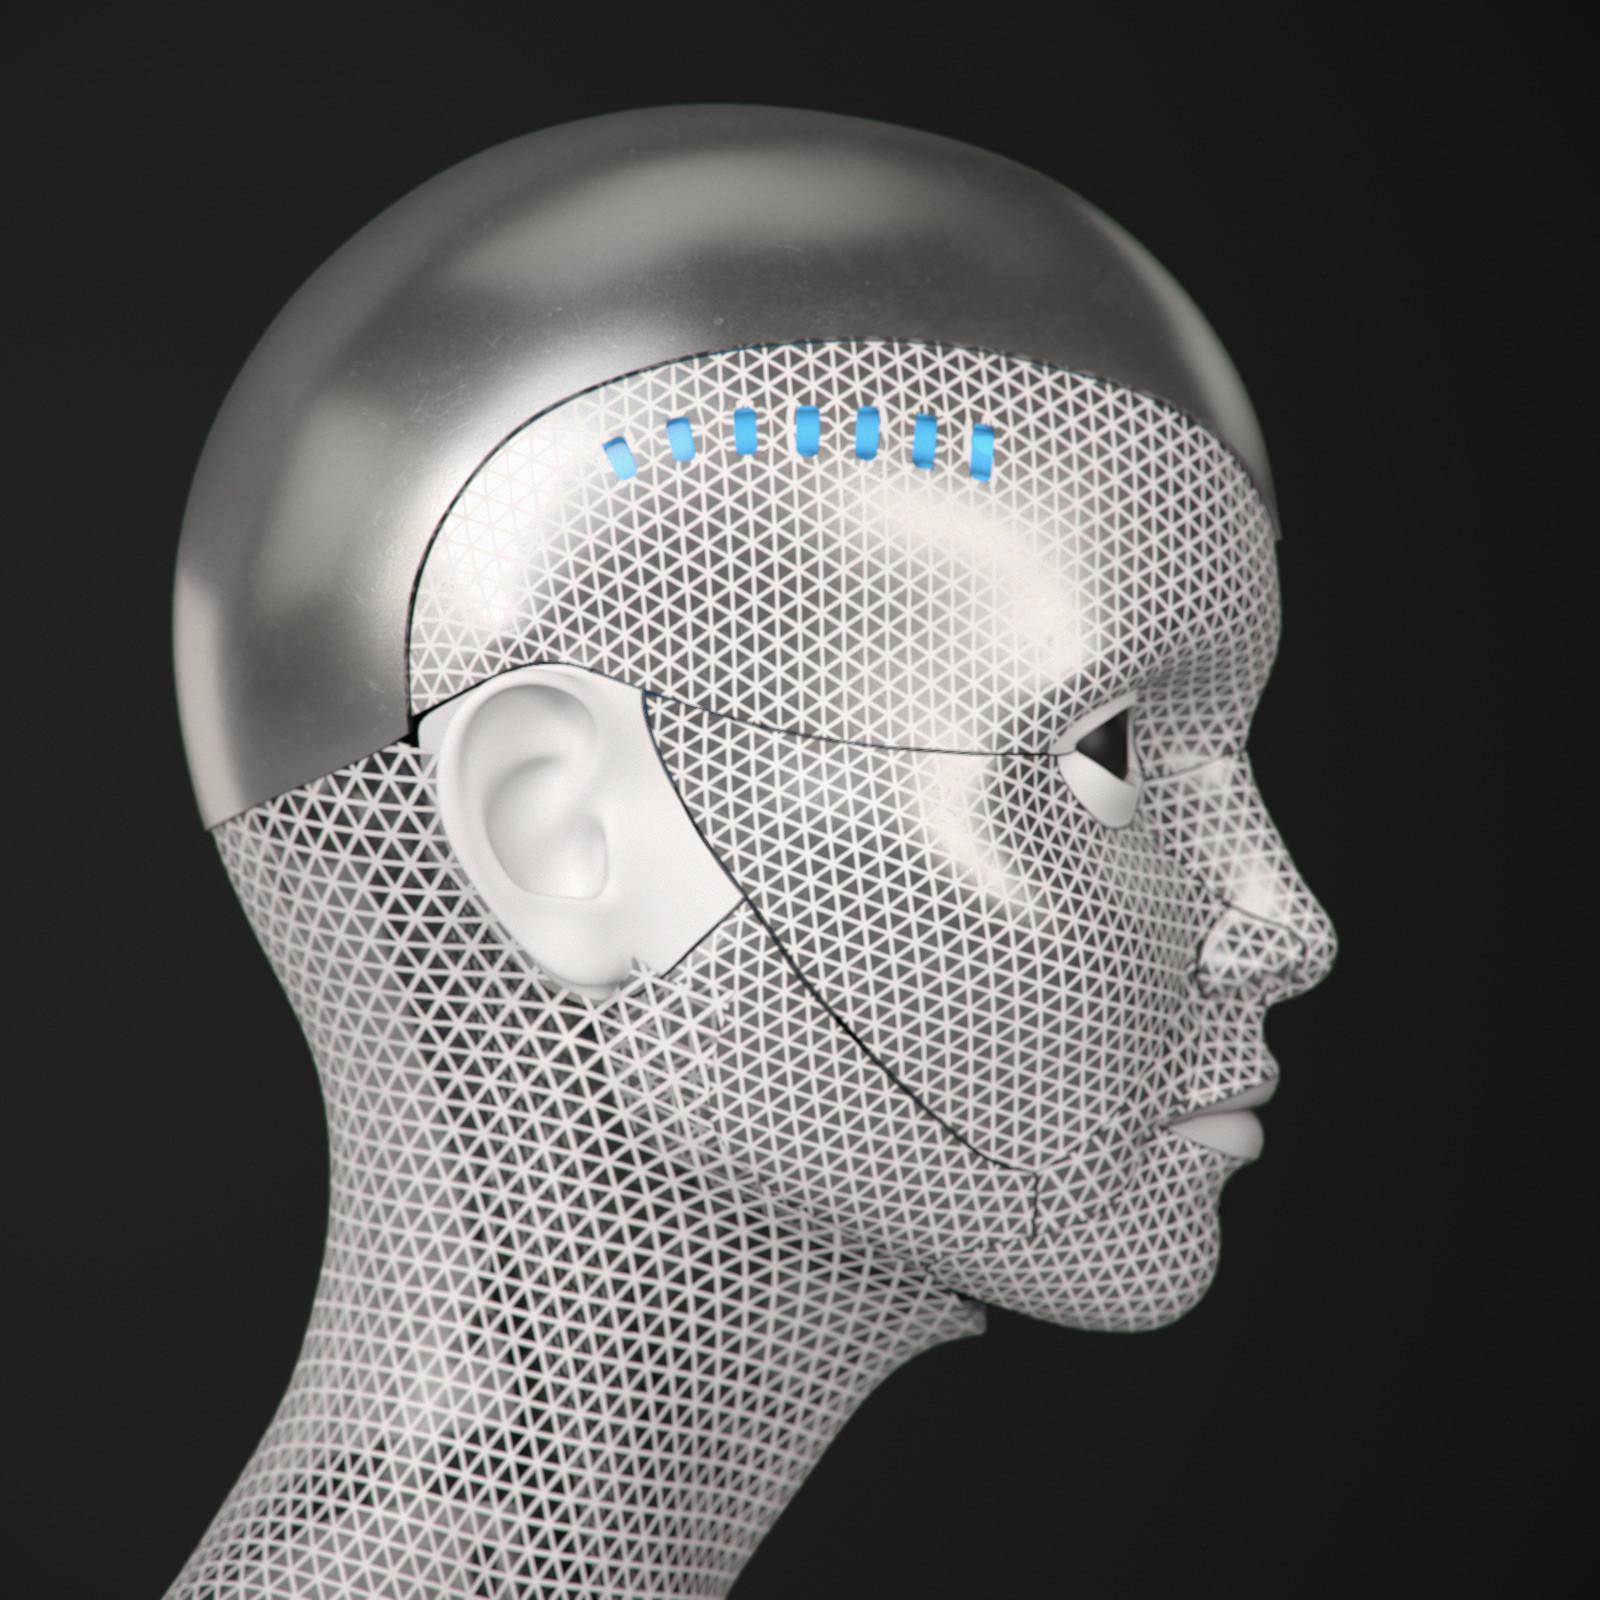 Cgmonkeyking dvc face cyborg pn01 pp01 side